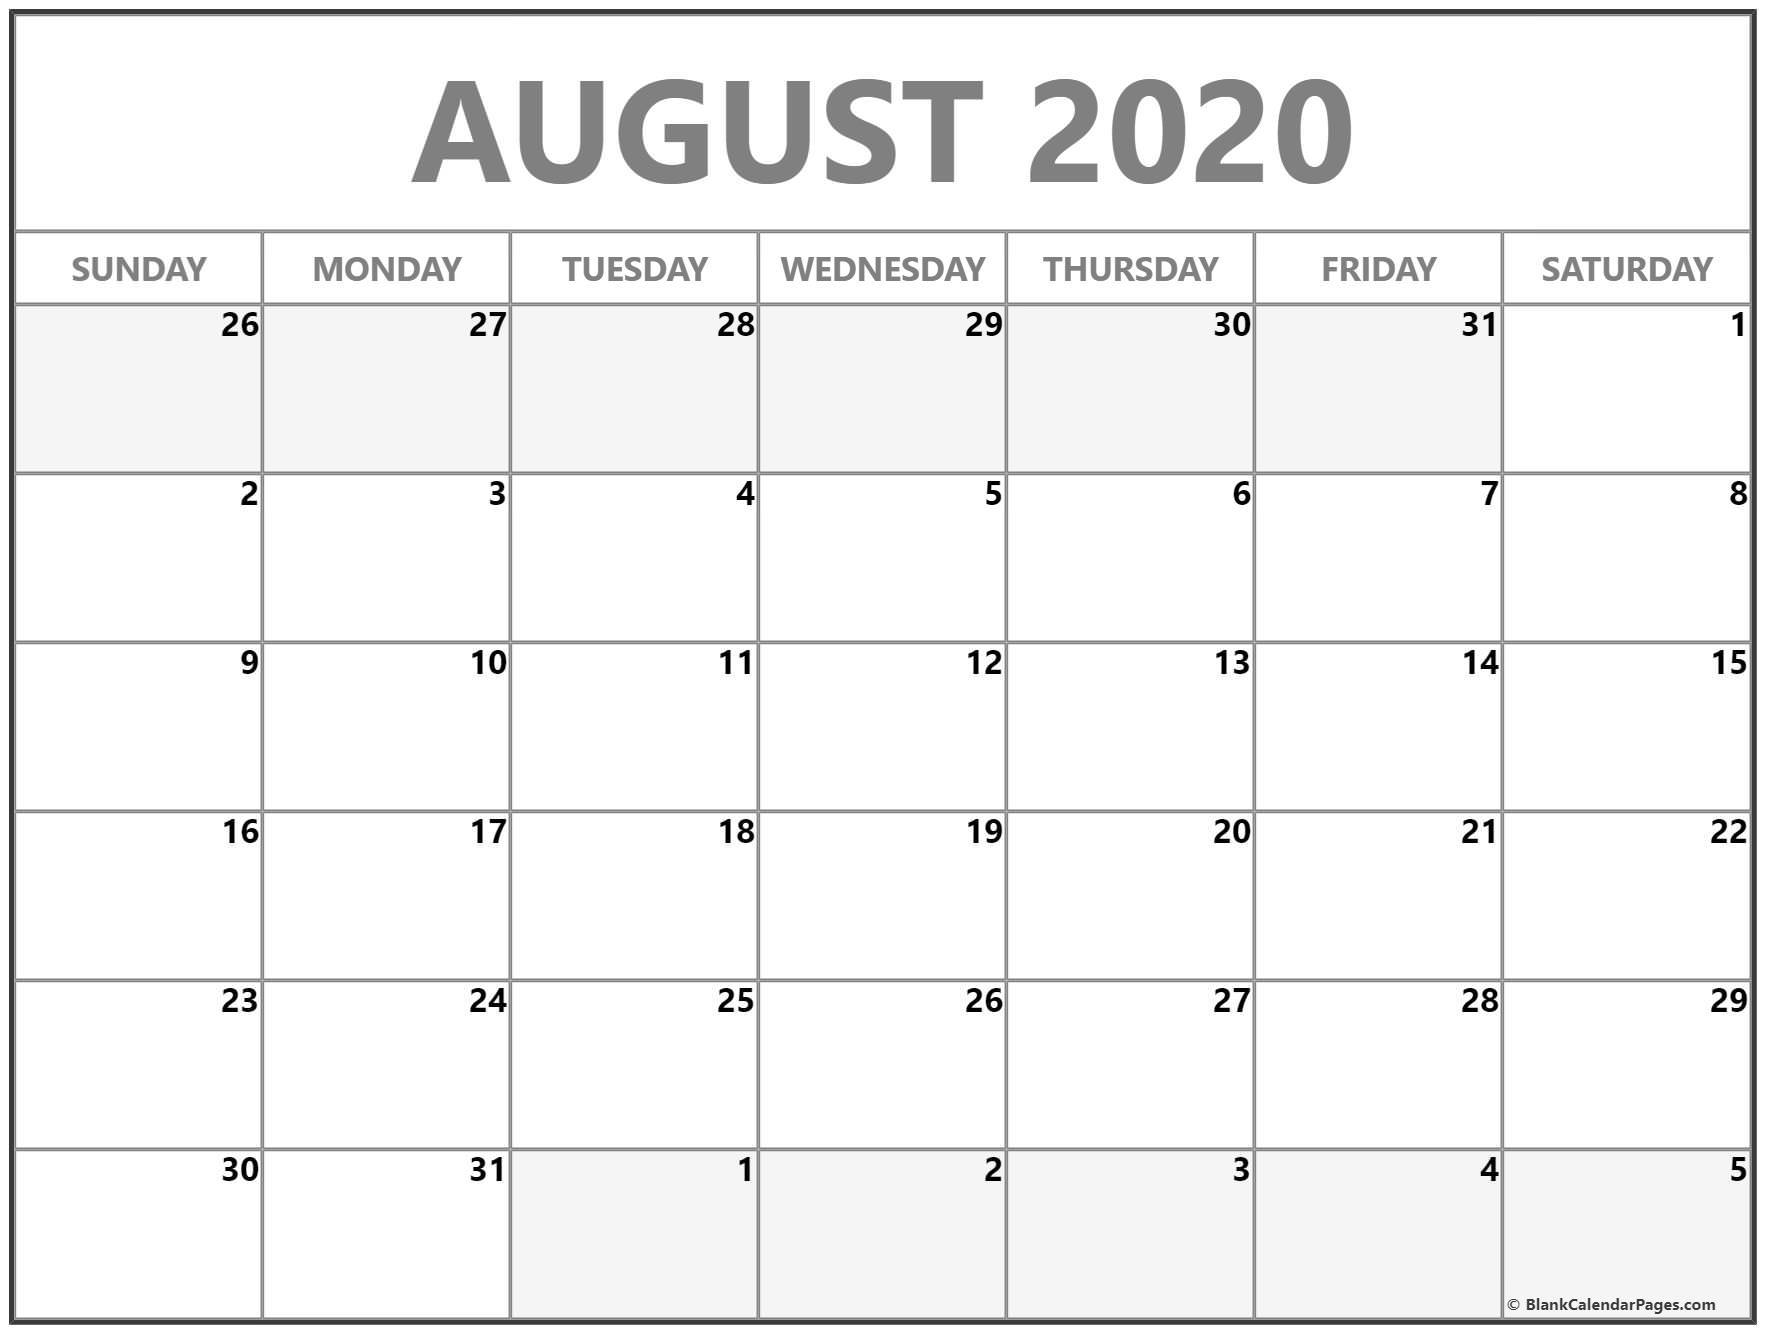 August 2020 Calendar | Free Printable Monthly Calendars